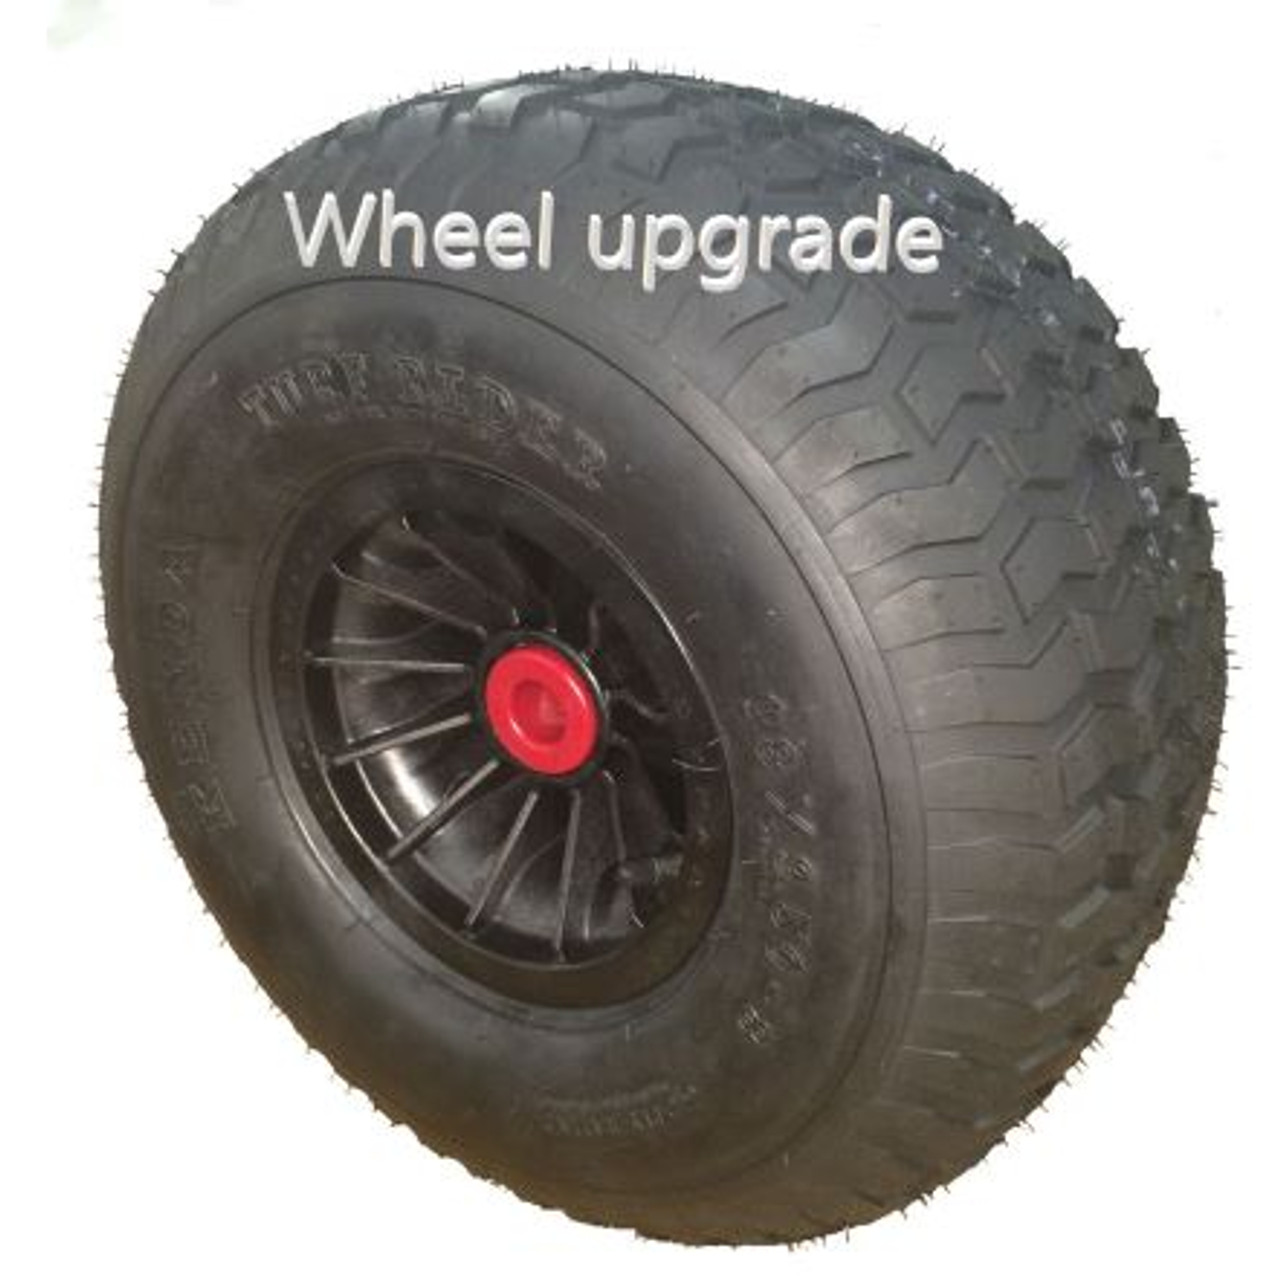 Wheel upgrade